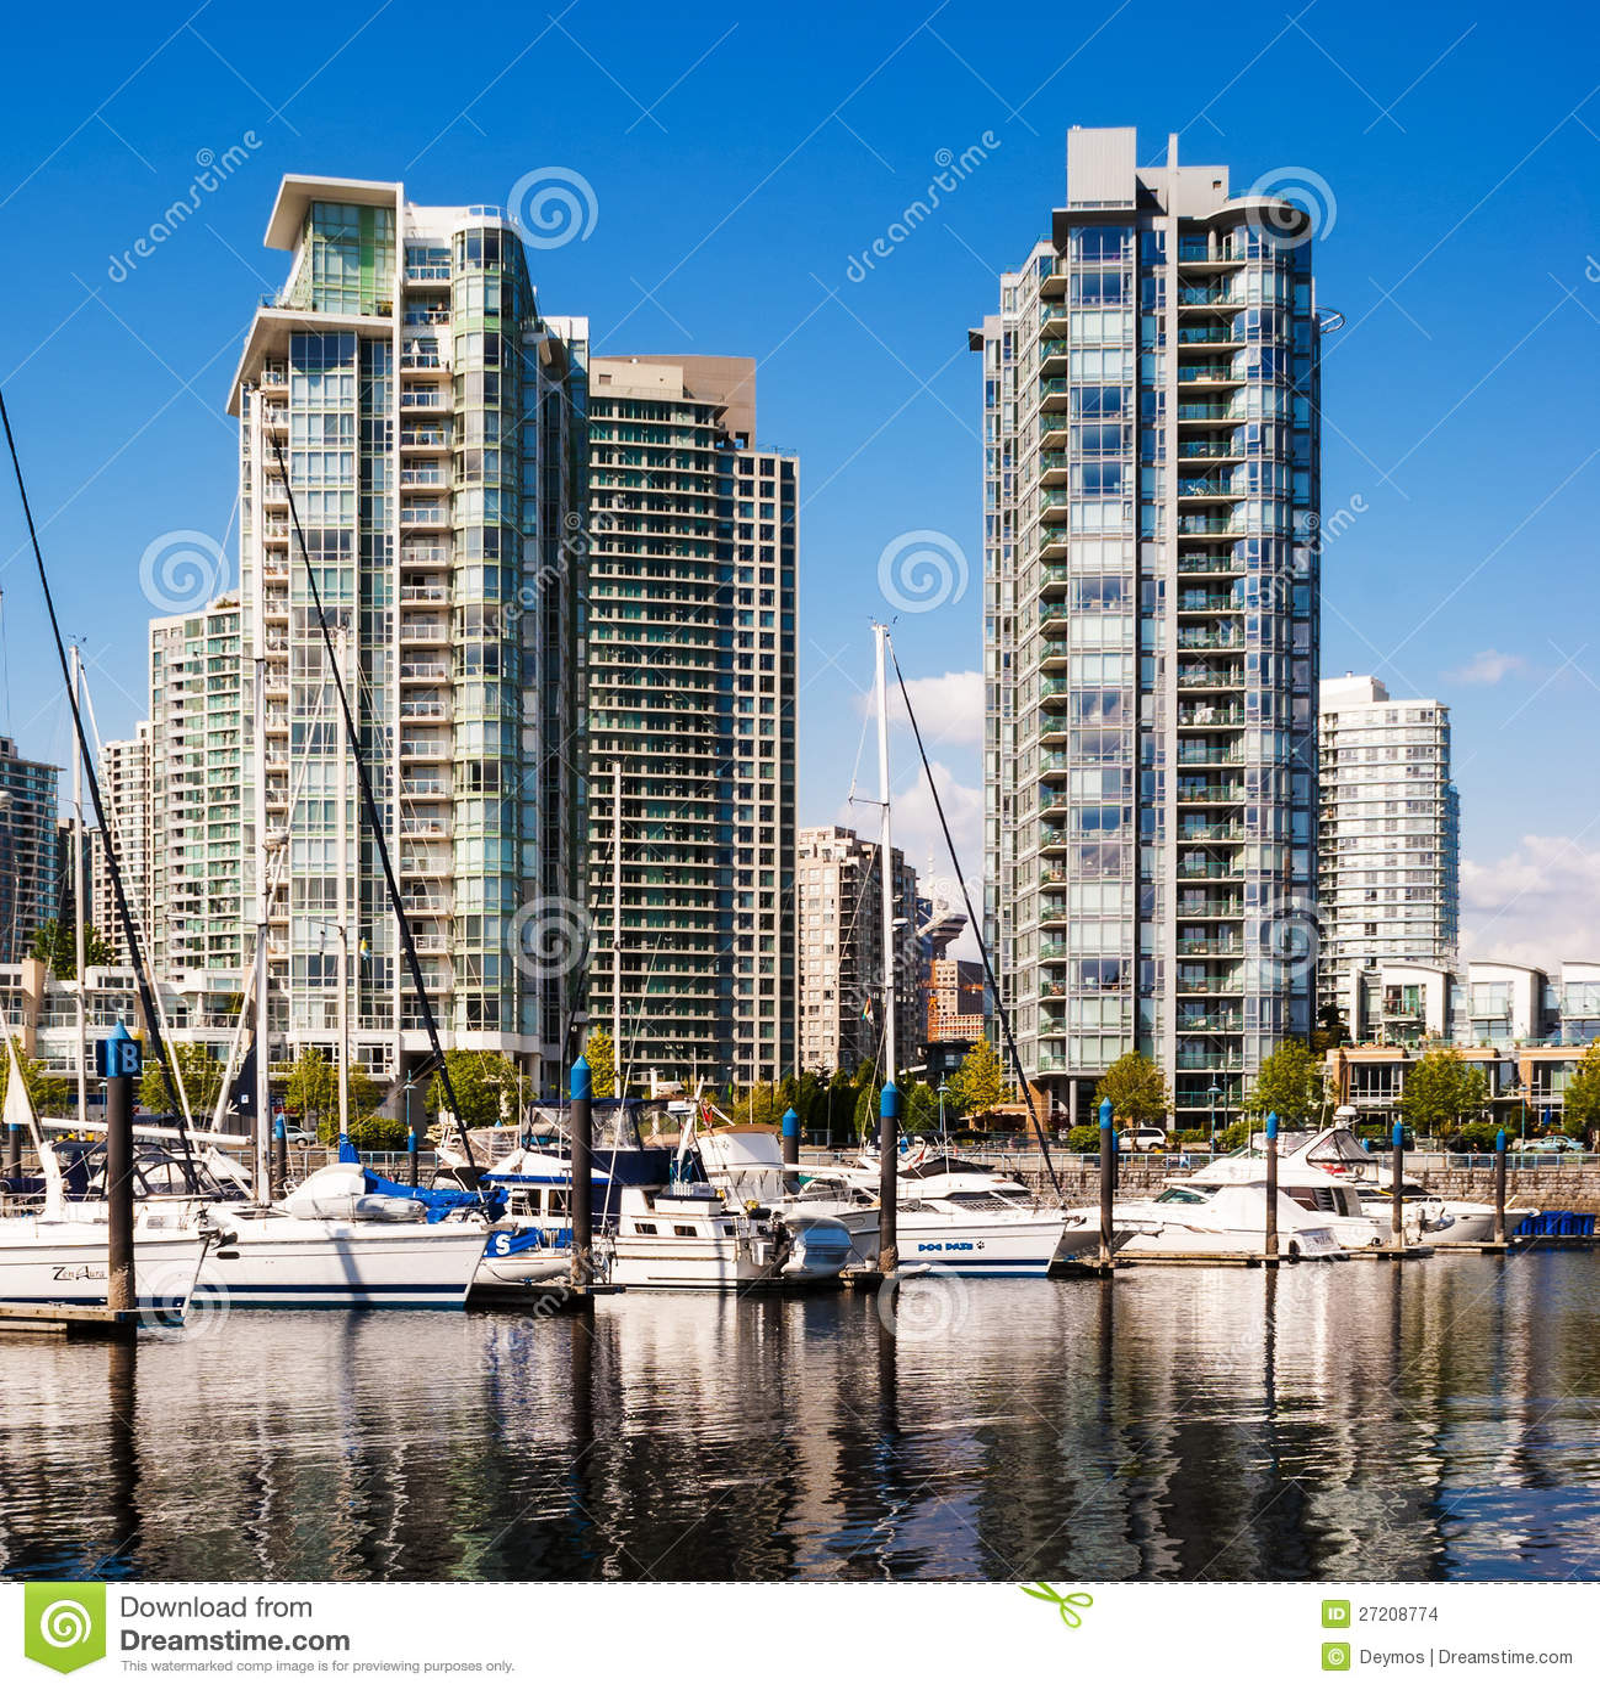 Yaletown Vancouver: Yaletown Residential Buildings, Vancouver, Canada